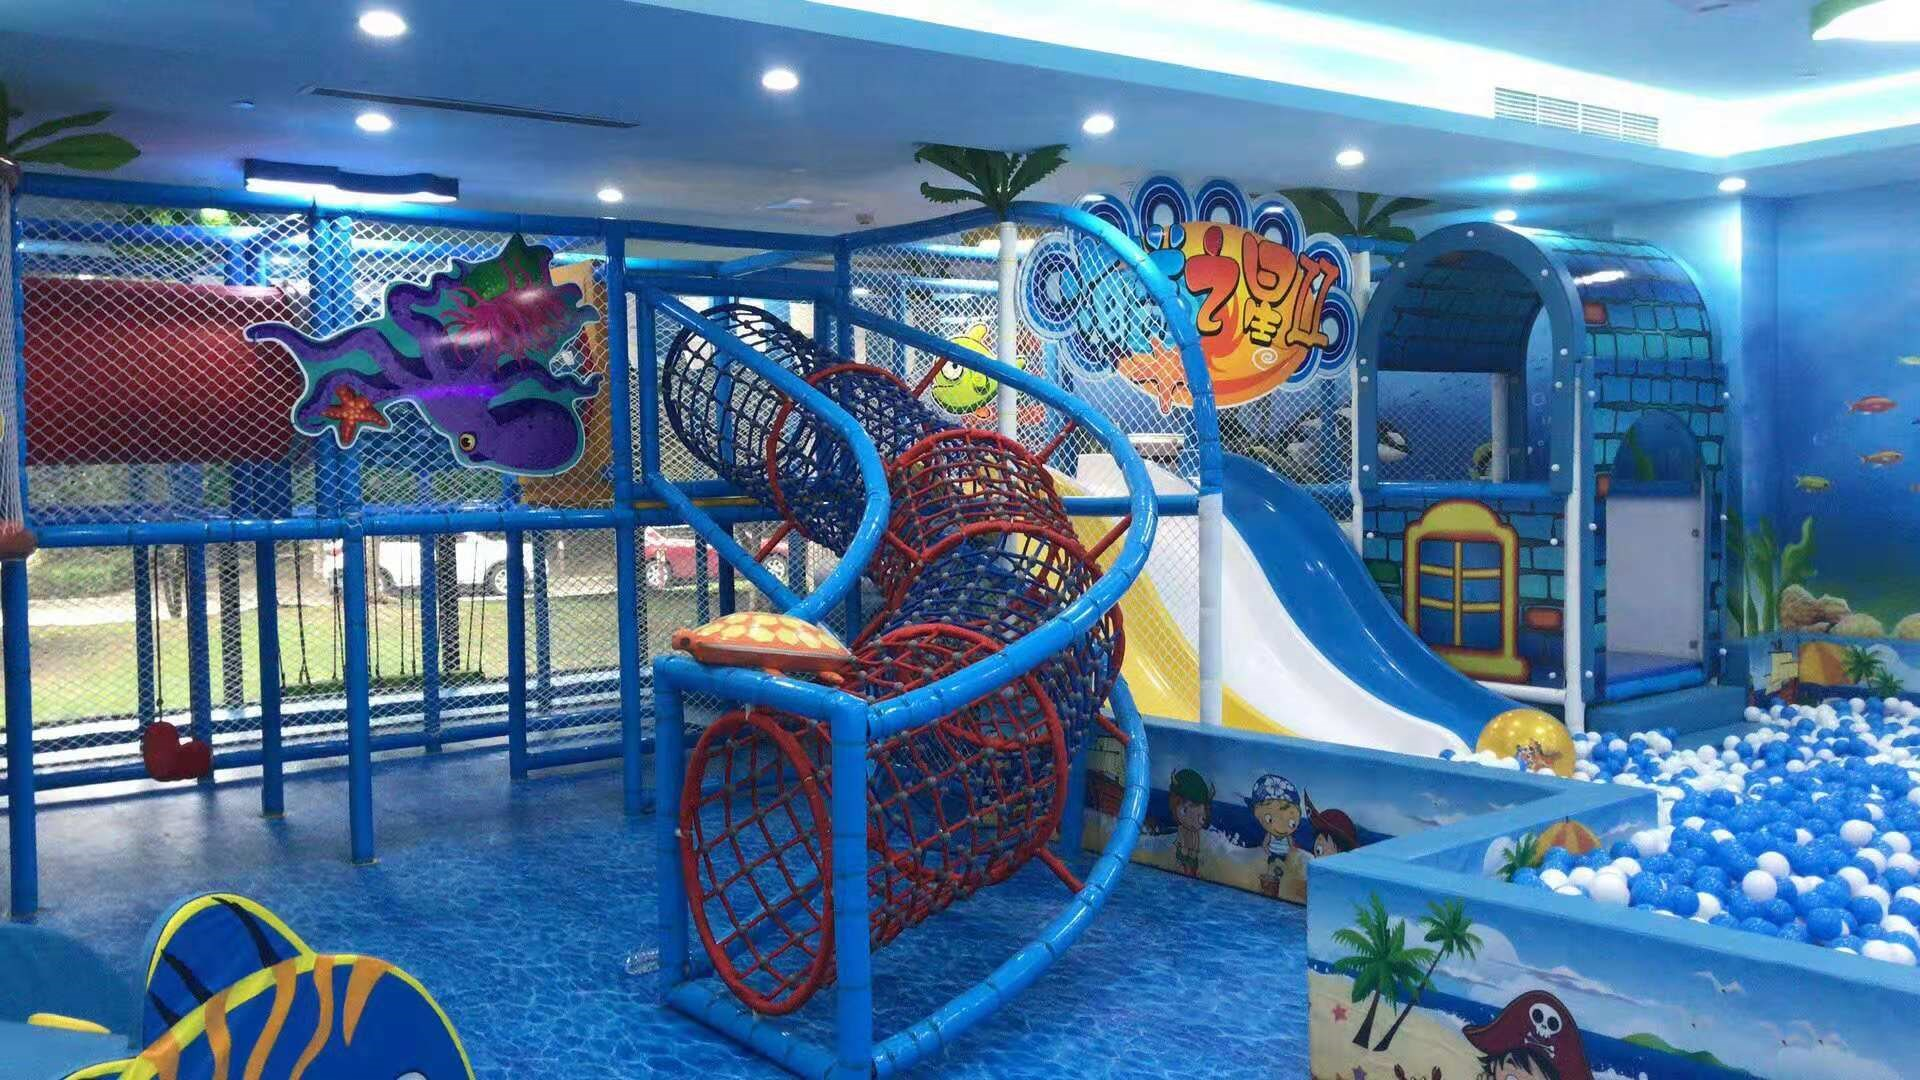 Custom Kids Indoor Soft Playground Manufacturers, Custom Kids Indoor Soft Playground Factory, Supply Custom Kids Indoor Soft Playground